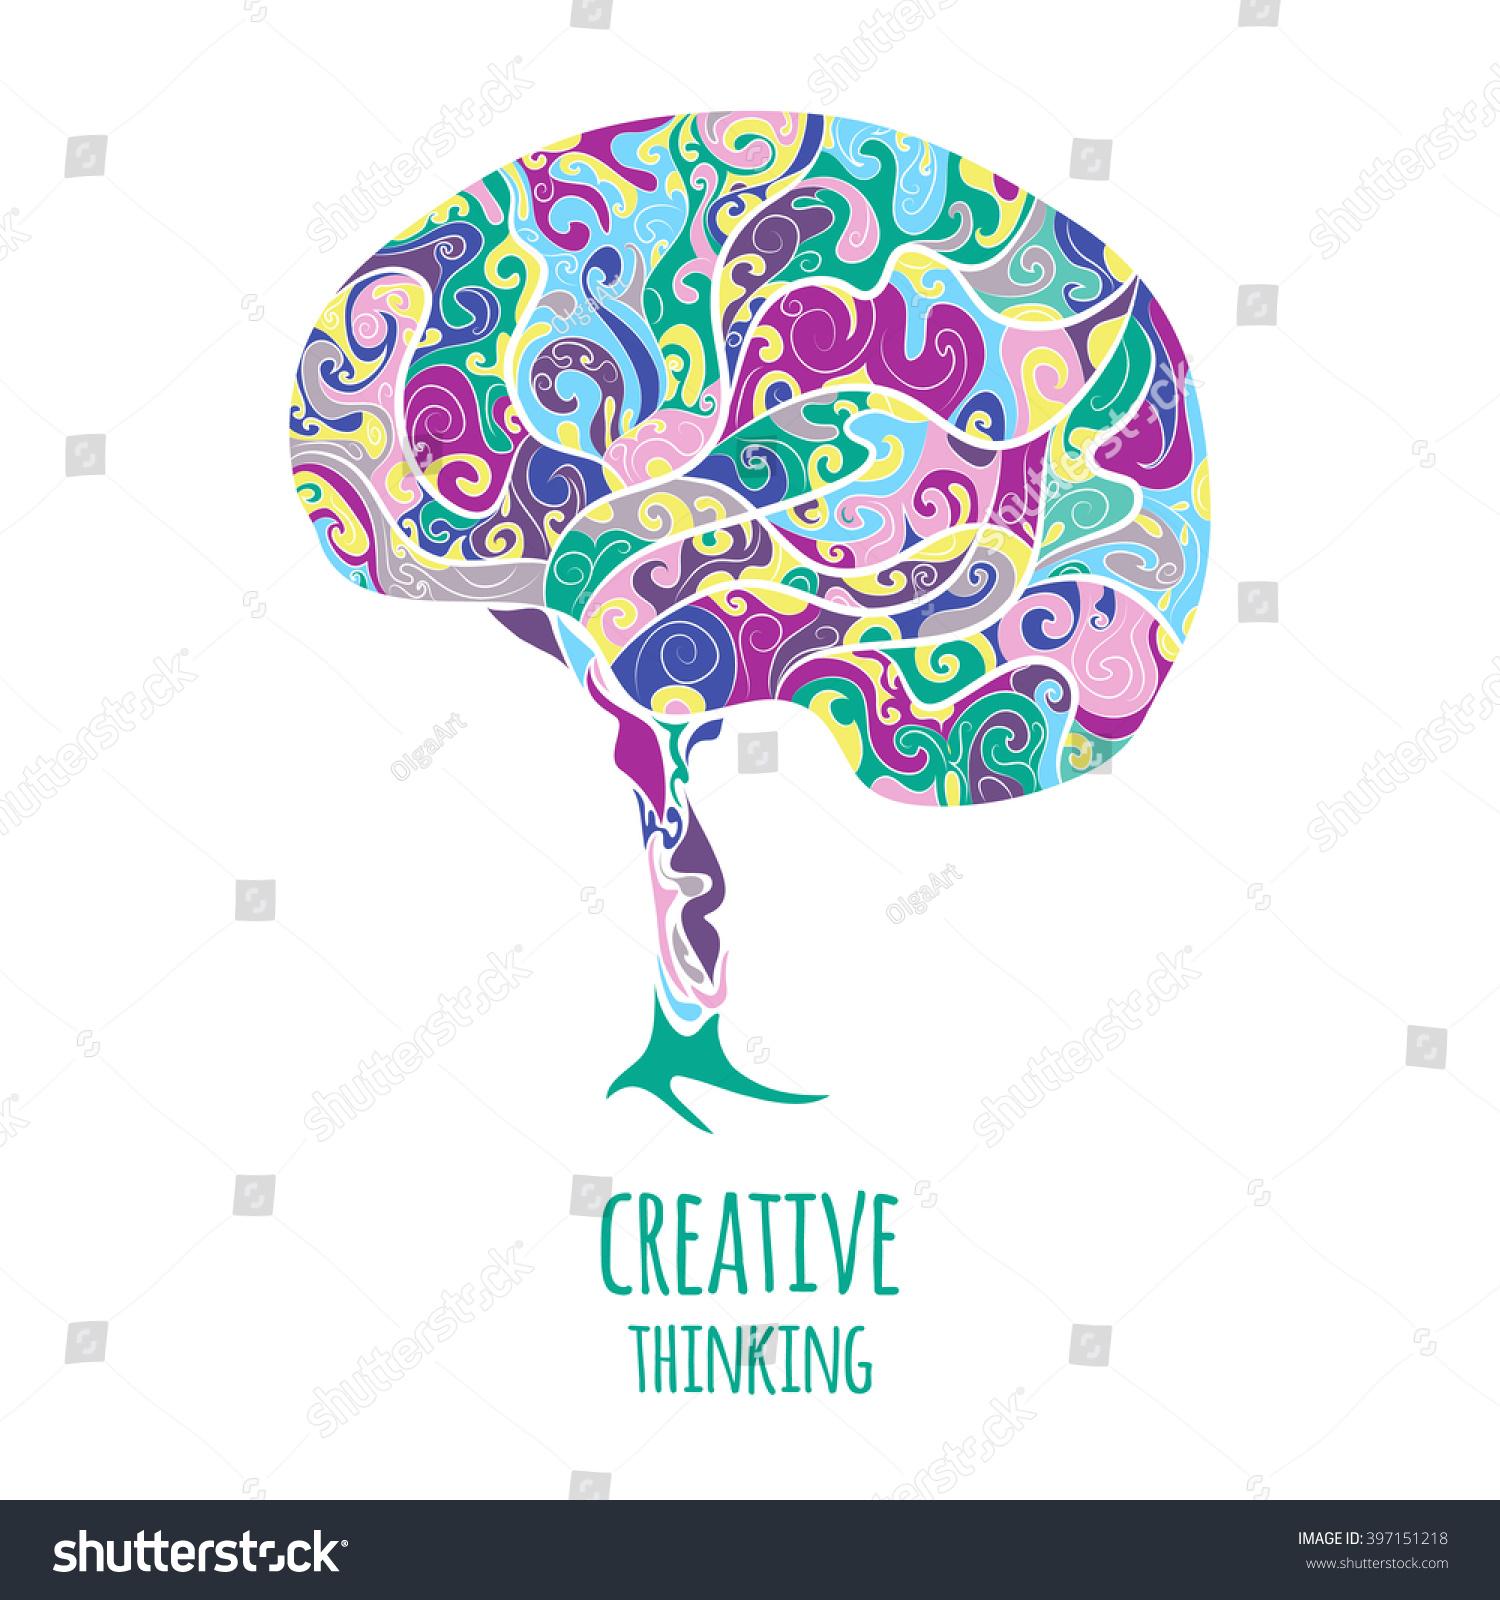 Royalty-free Creative thinking. Brain #397151218 Stock